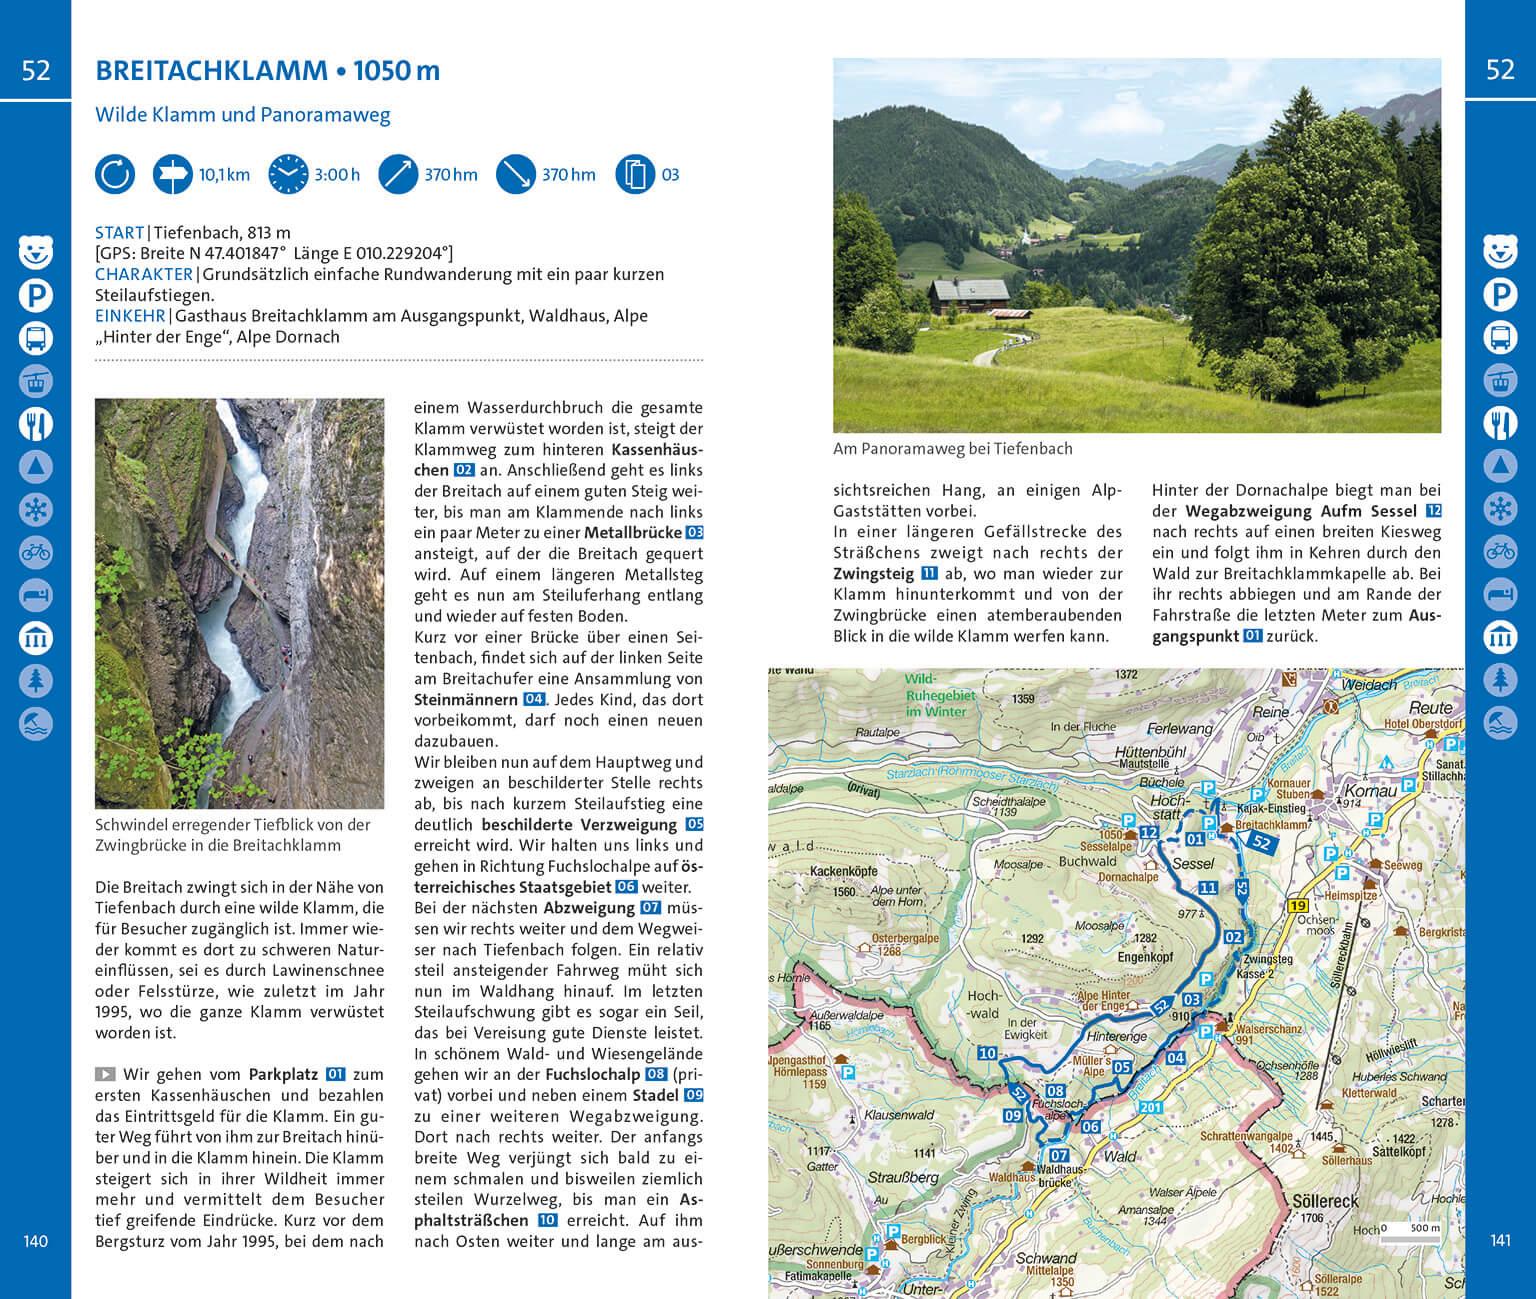 Artikel_Produkte_Grosse-Wanderbücher_04